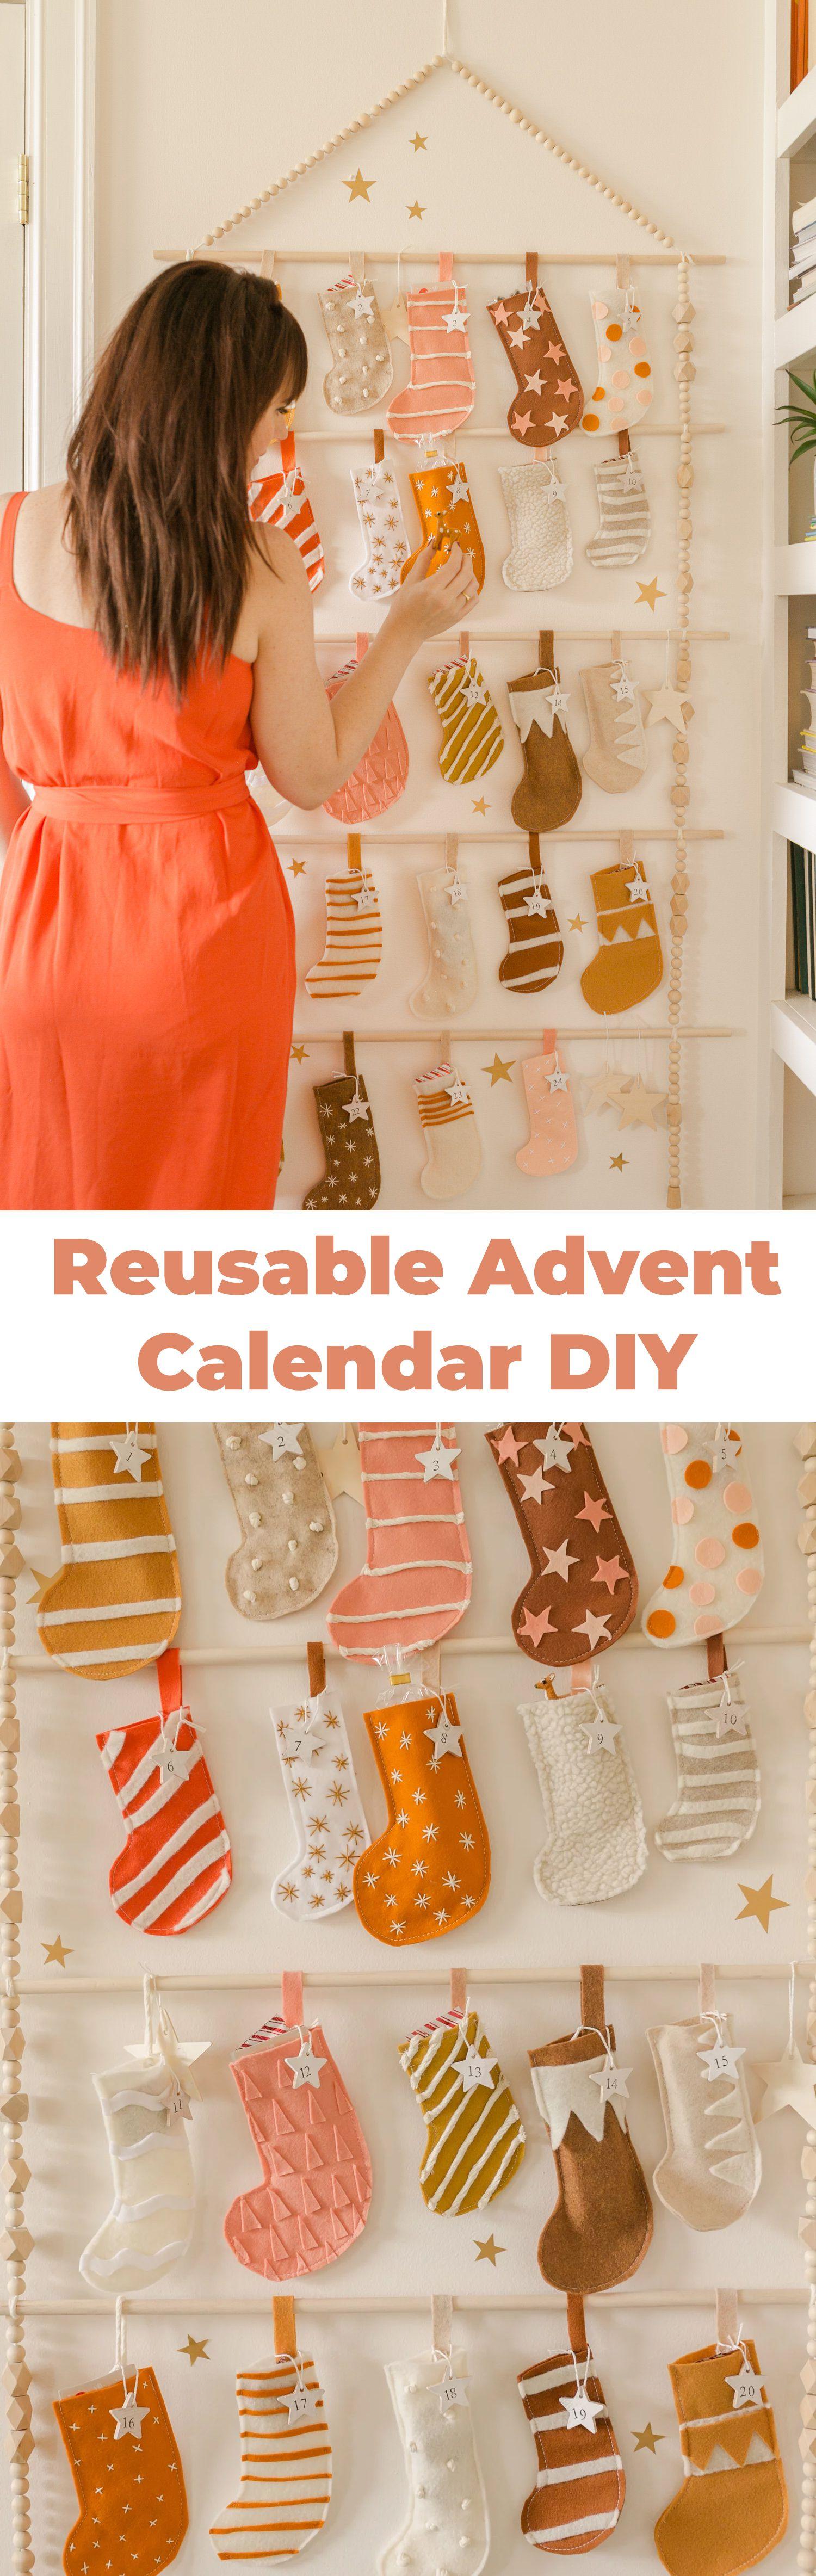 Heirloom Advent Calendar Diy Holiday Spirit